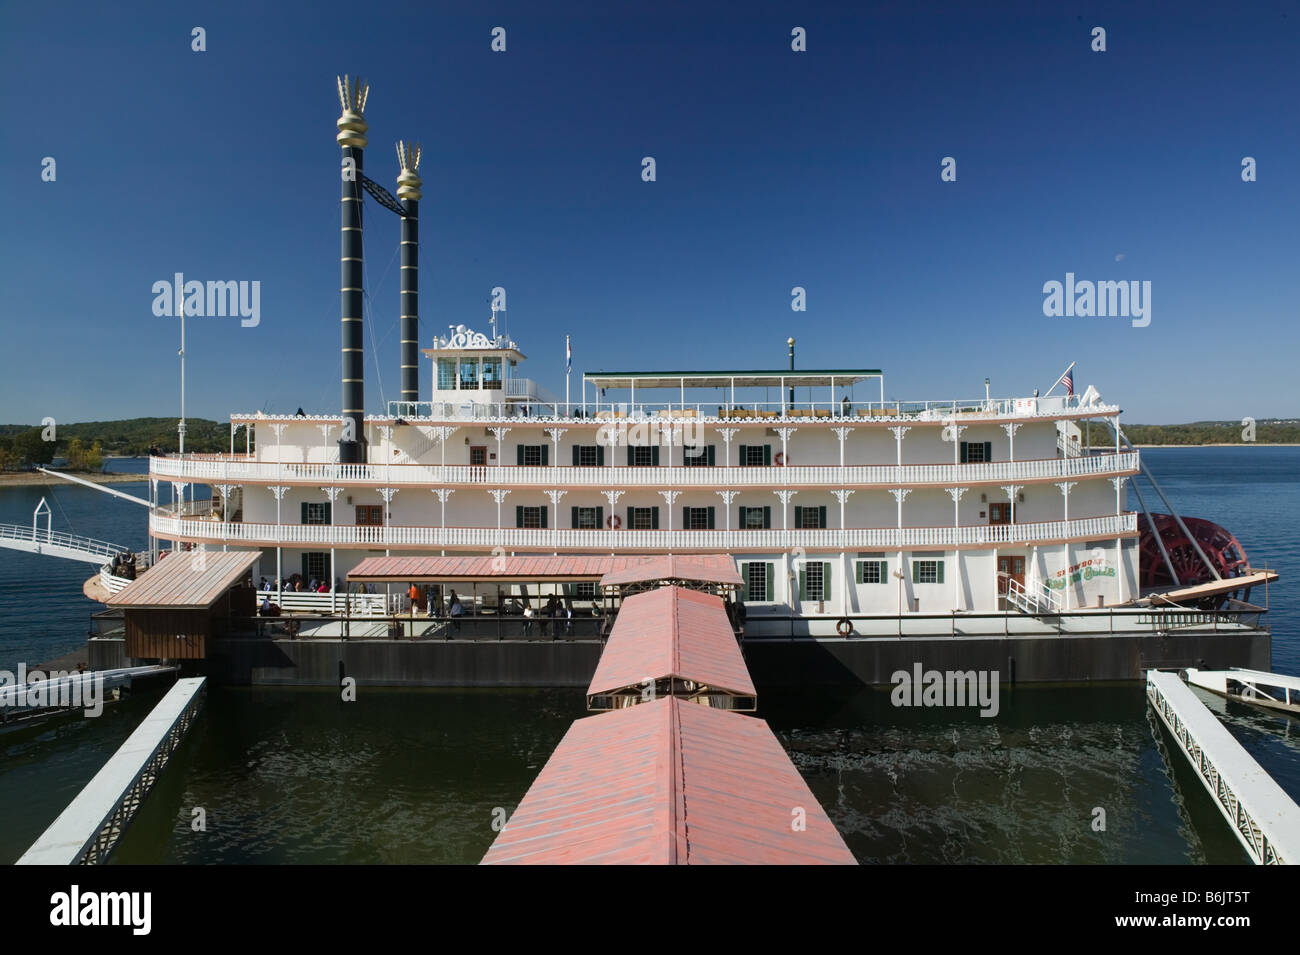 USA, Missouri, Branson, Branson Belle Showboat on Lake